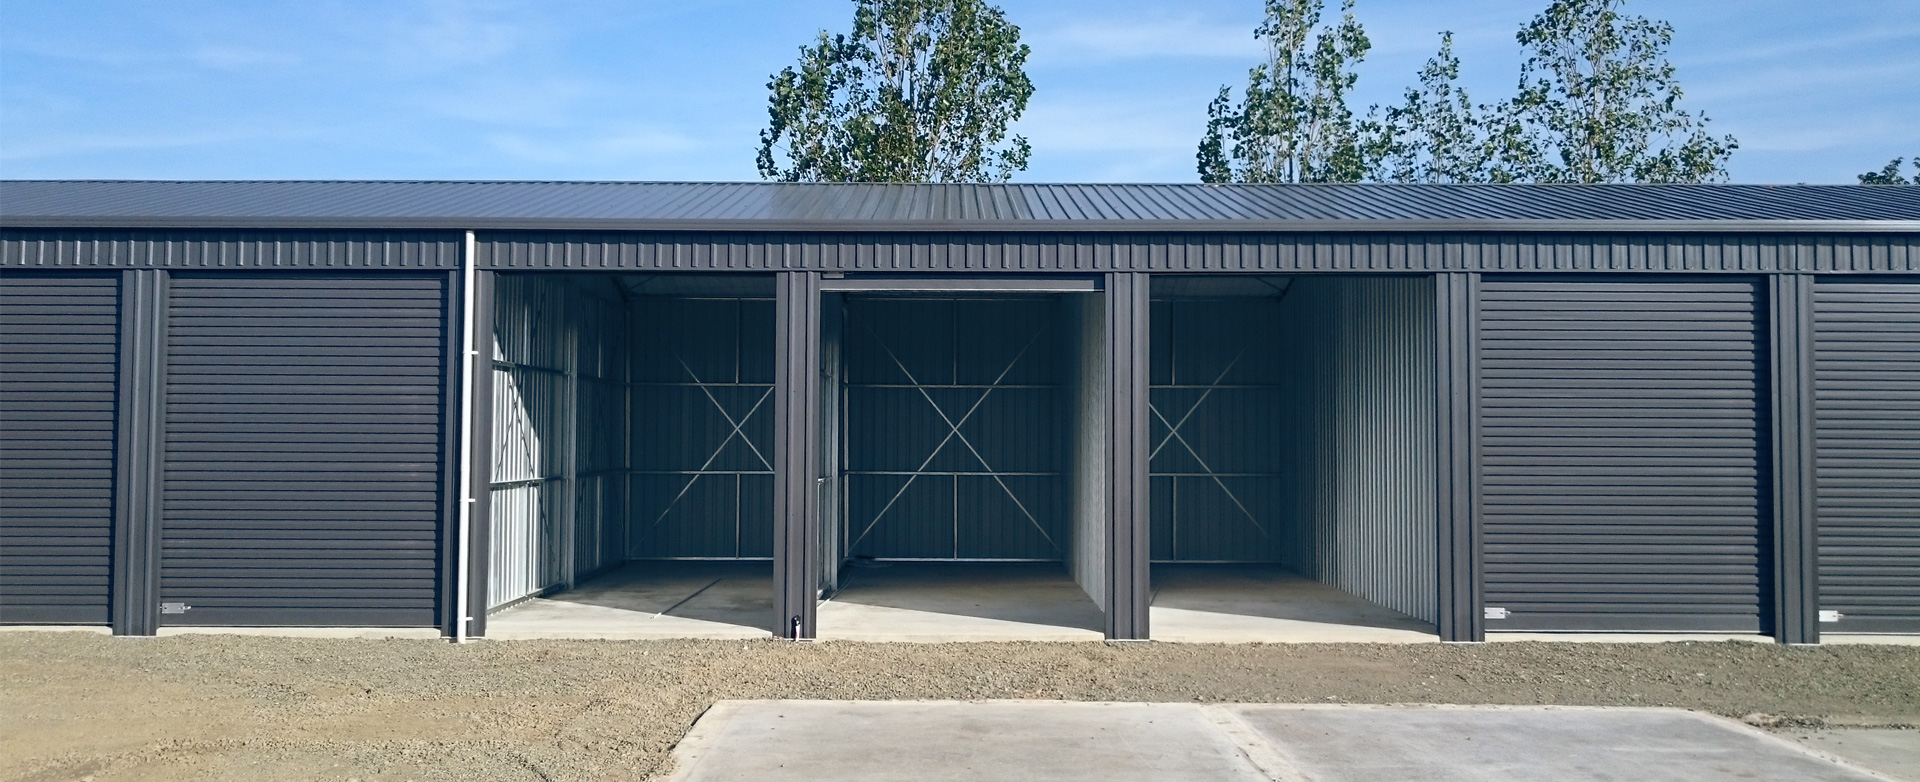 Asf Ashburton Storage Facilities Self Storage Units